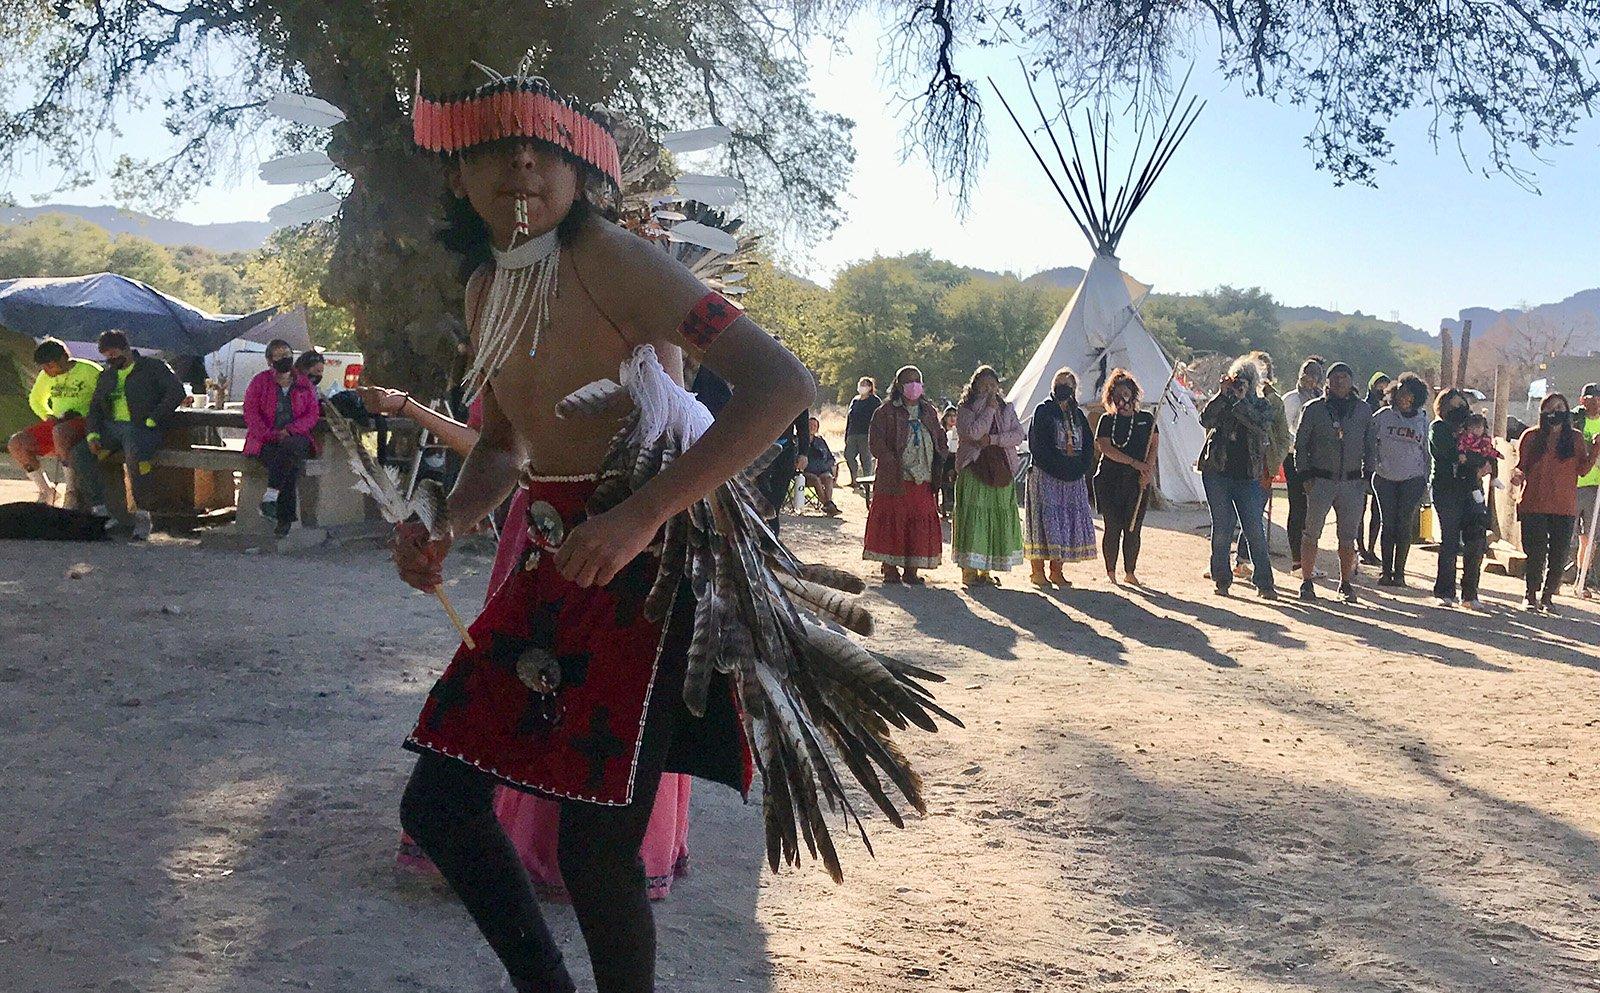 Waya Brown, who is Apache and Pomo, dances in a circle at Oak Flat campground on Saturday, Feb. 27, 2021, near Superior, Arizona. RNS photo by Alejandra Molina